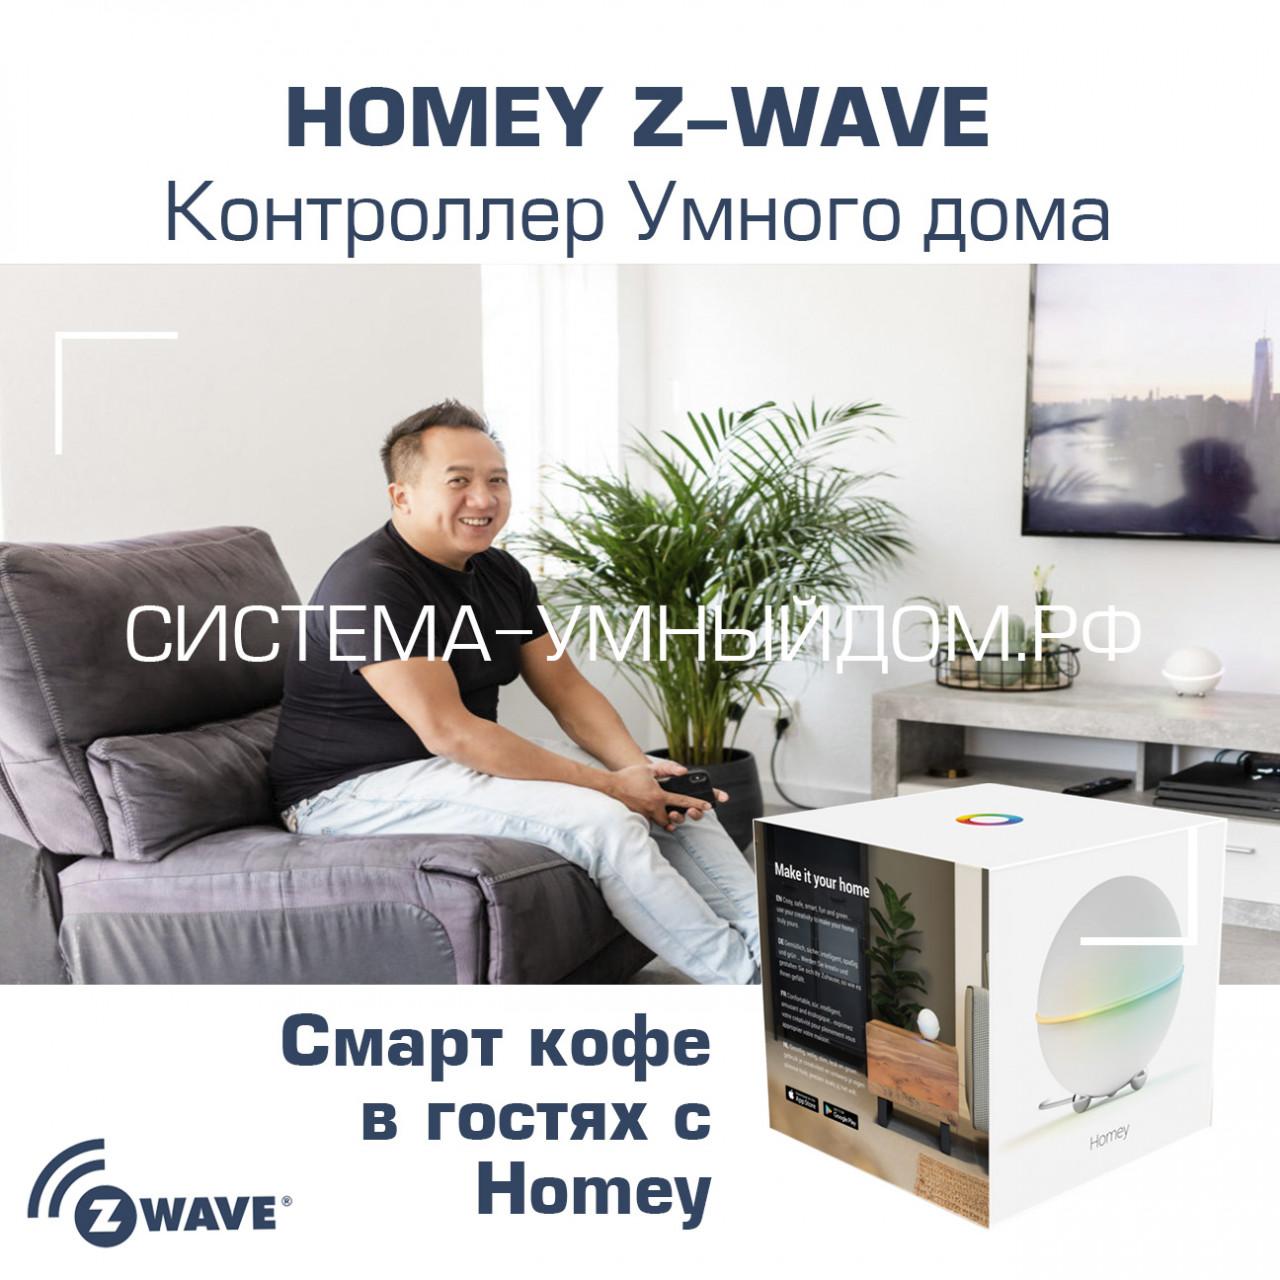 20191016_HomeyStories_Frank